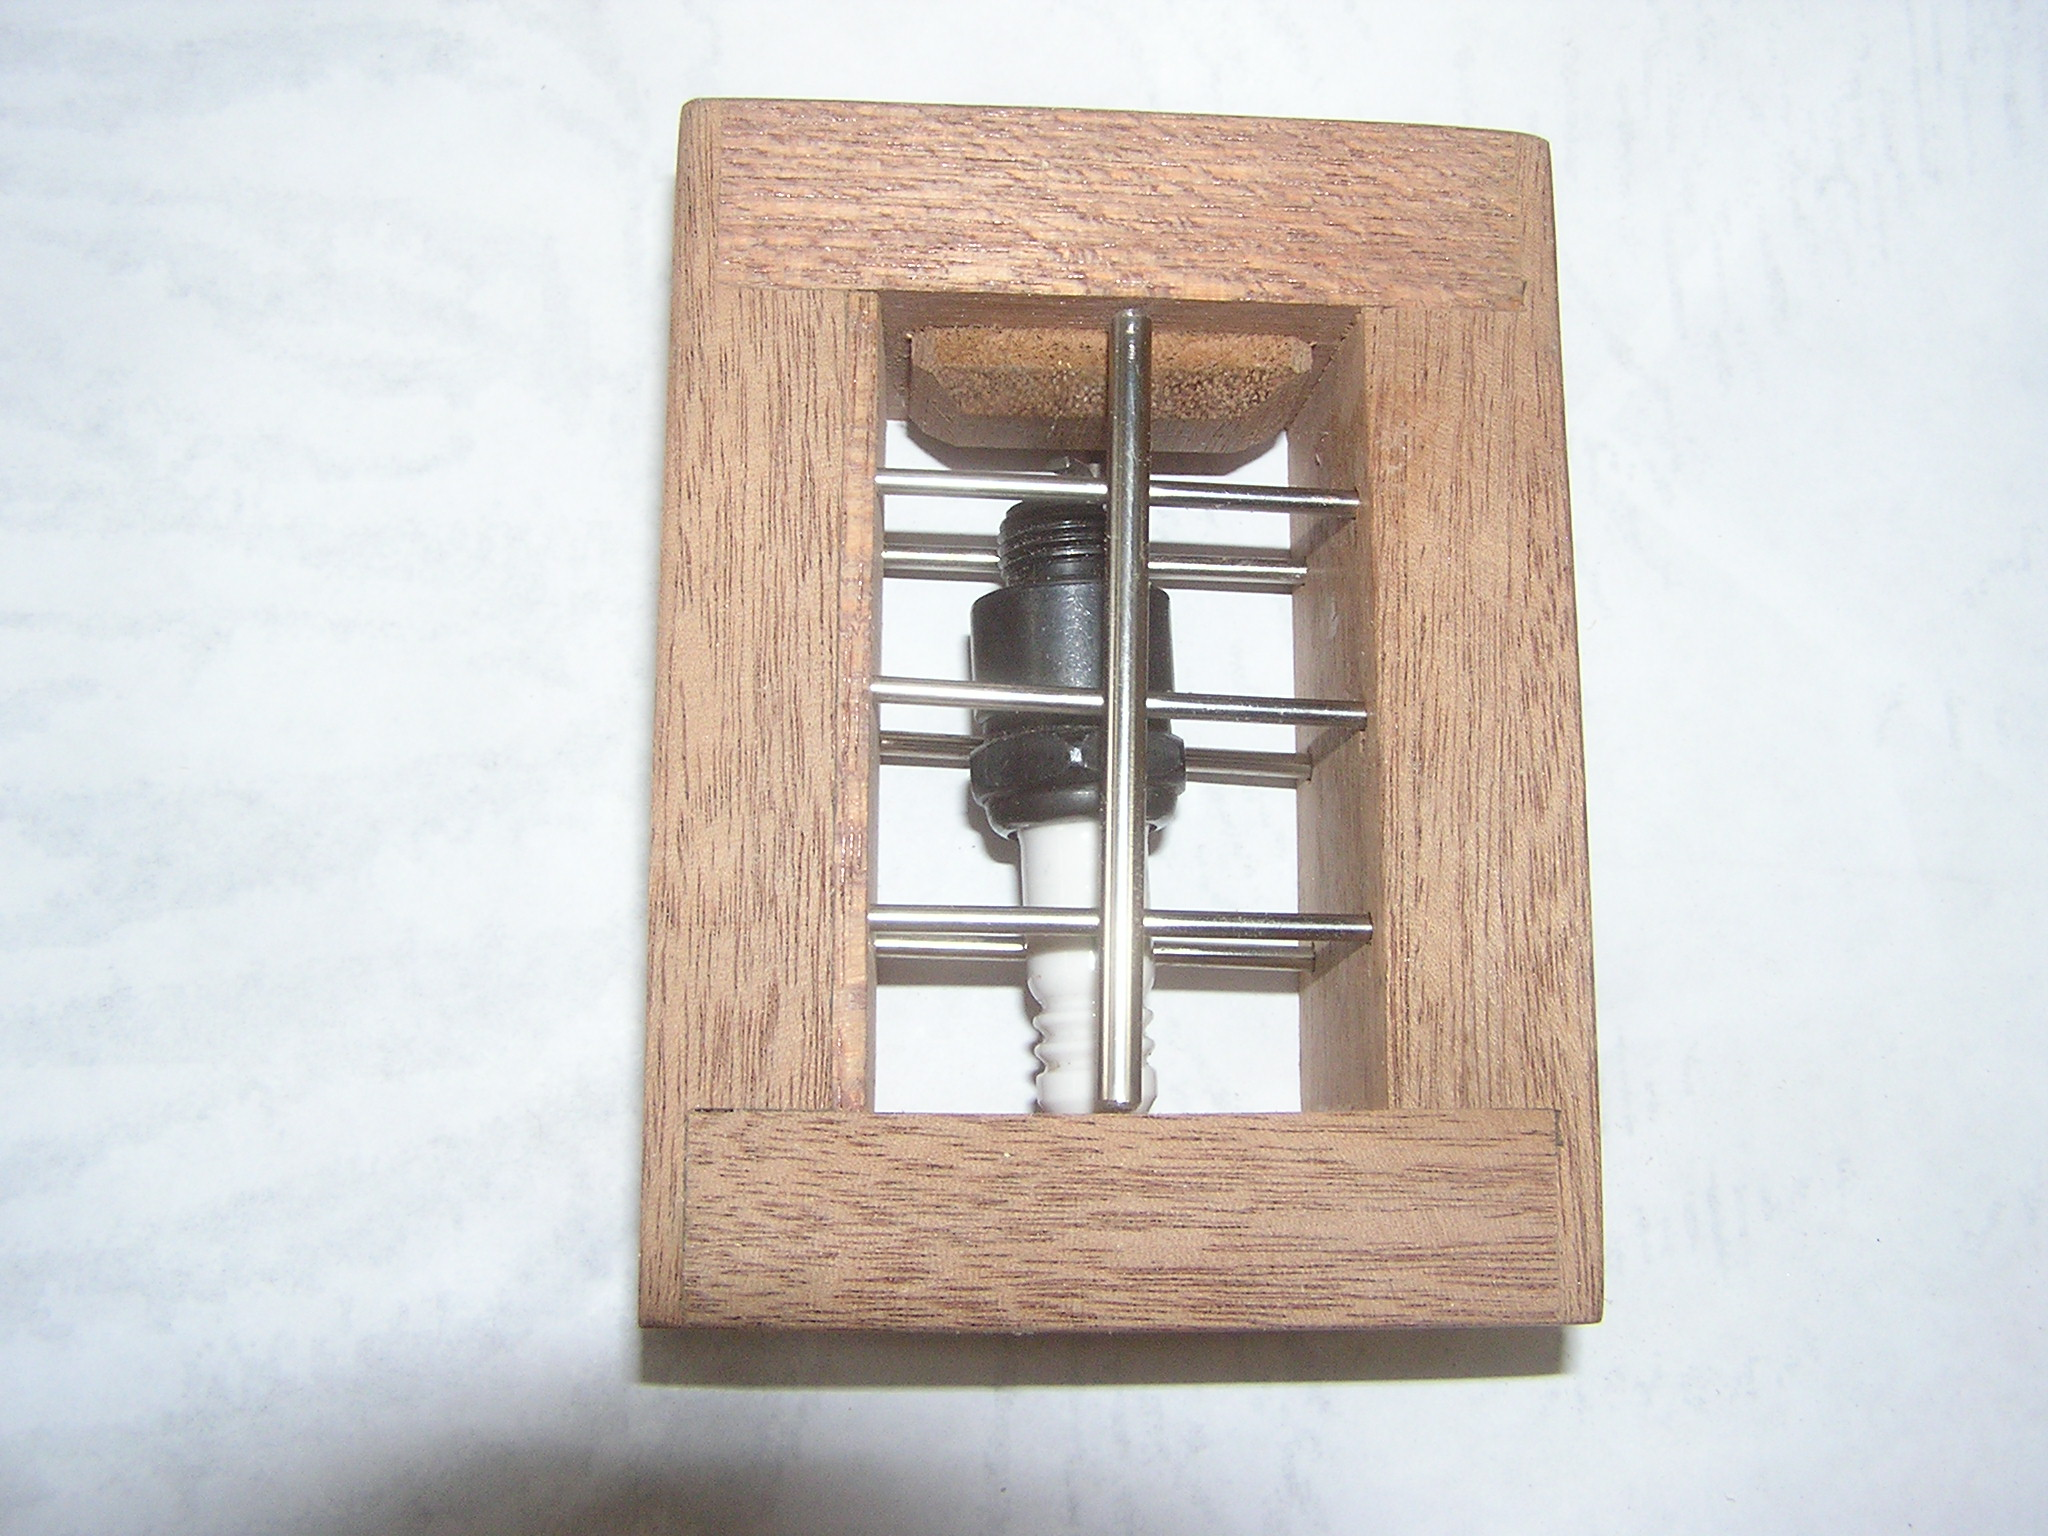 Spark Plug Puzzle